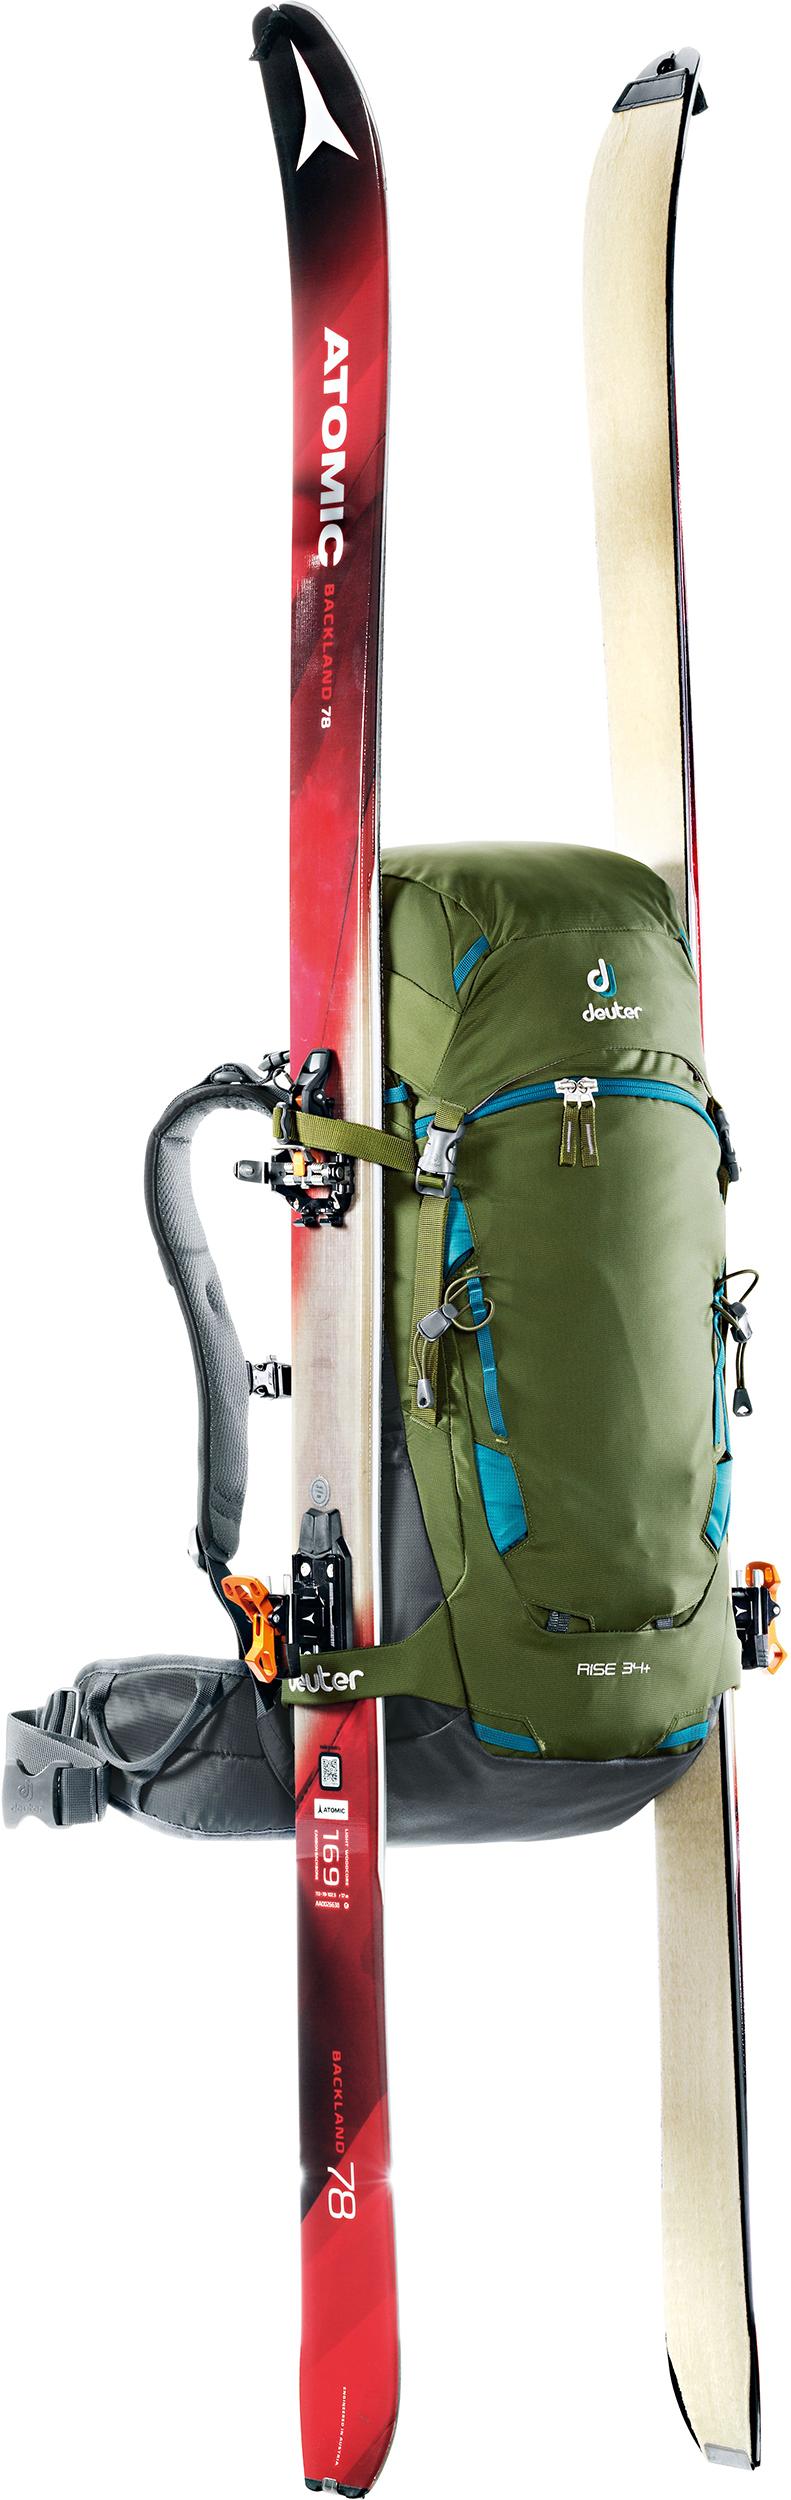 e3e1269070ce6 Deuter Rise 34+ Backpack - Unisex